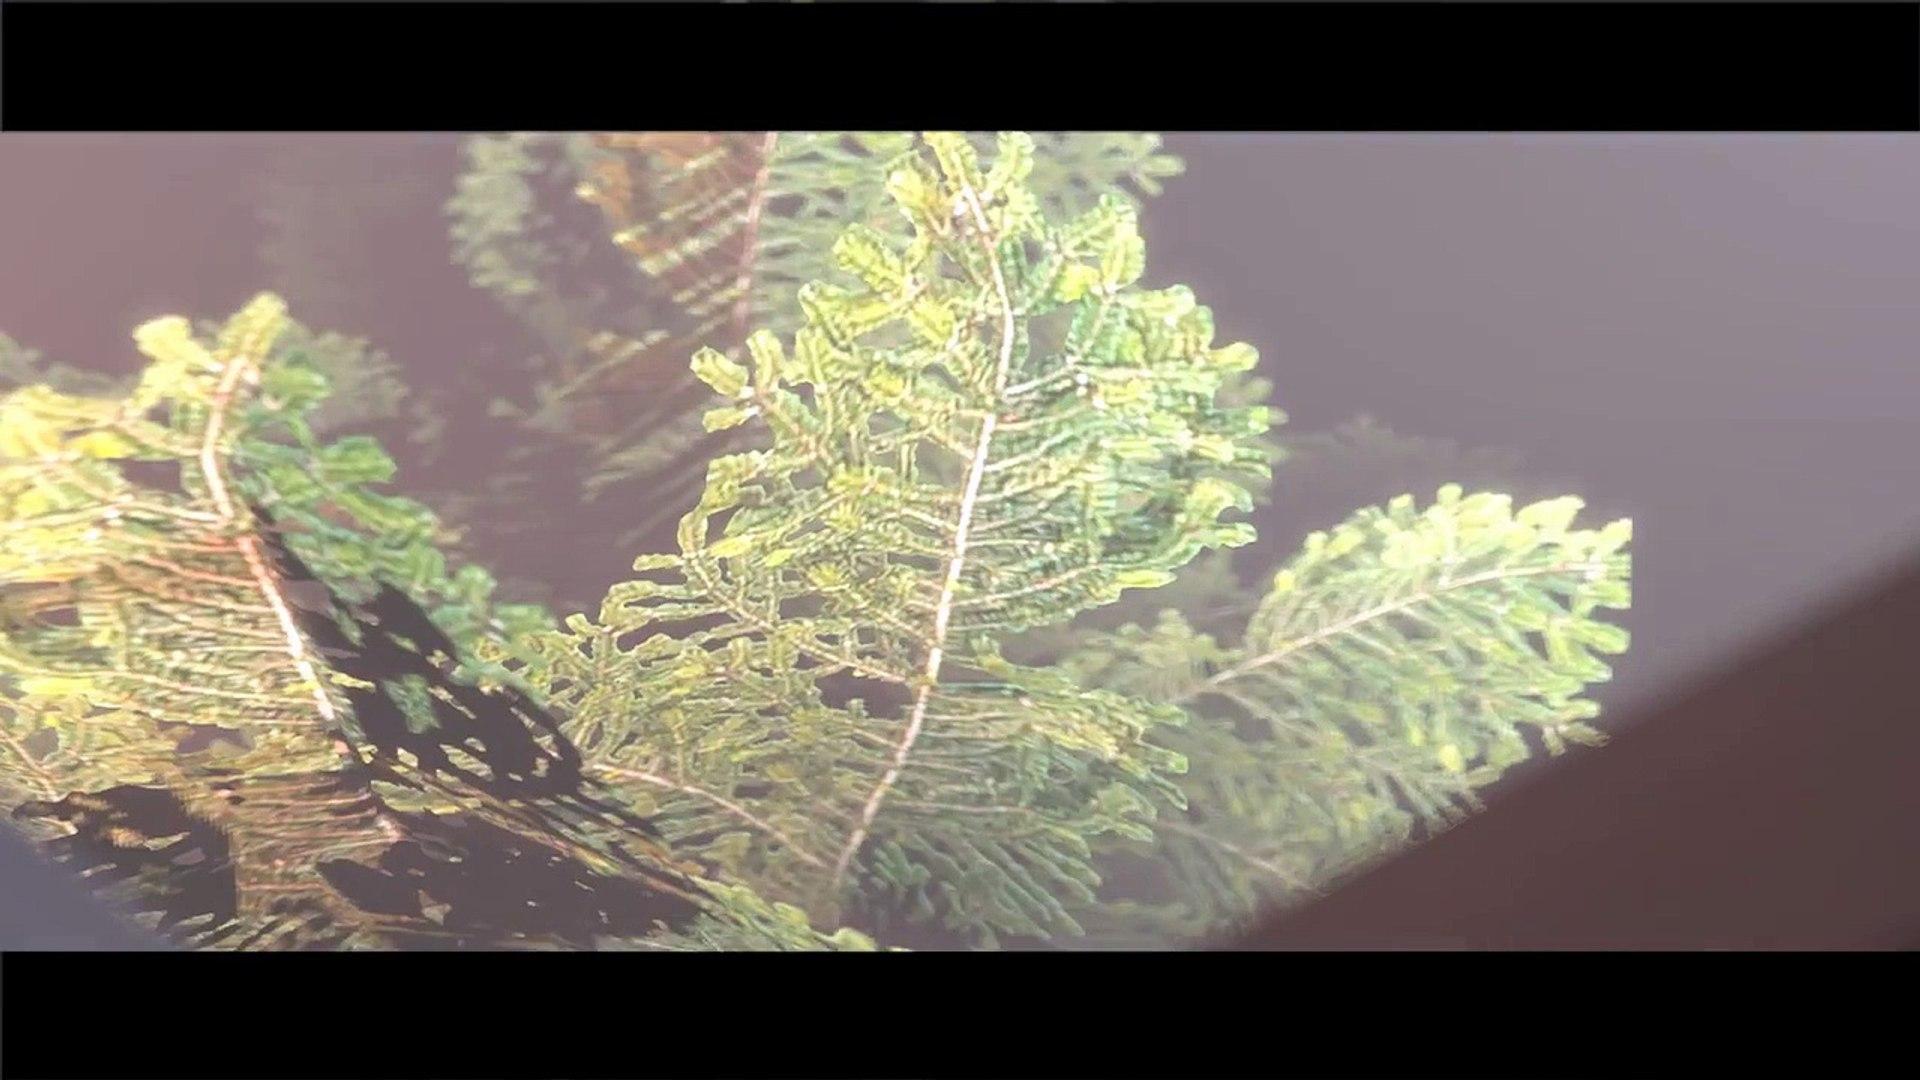 [SFM Undertale] UNDERTALE SONG (LOOSING CONTROL) UNDERTALE Music Video